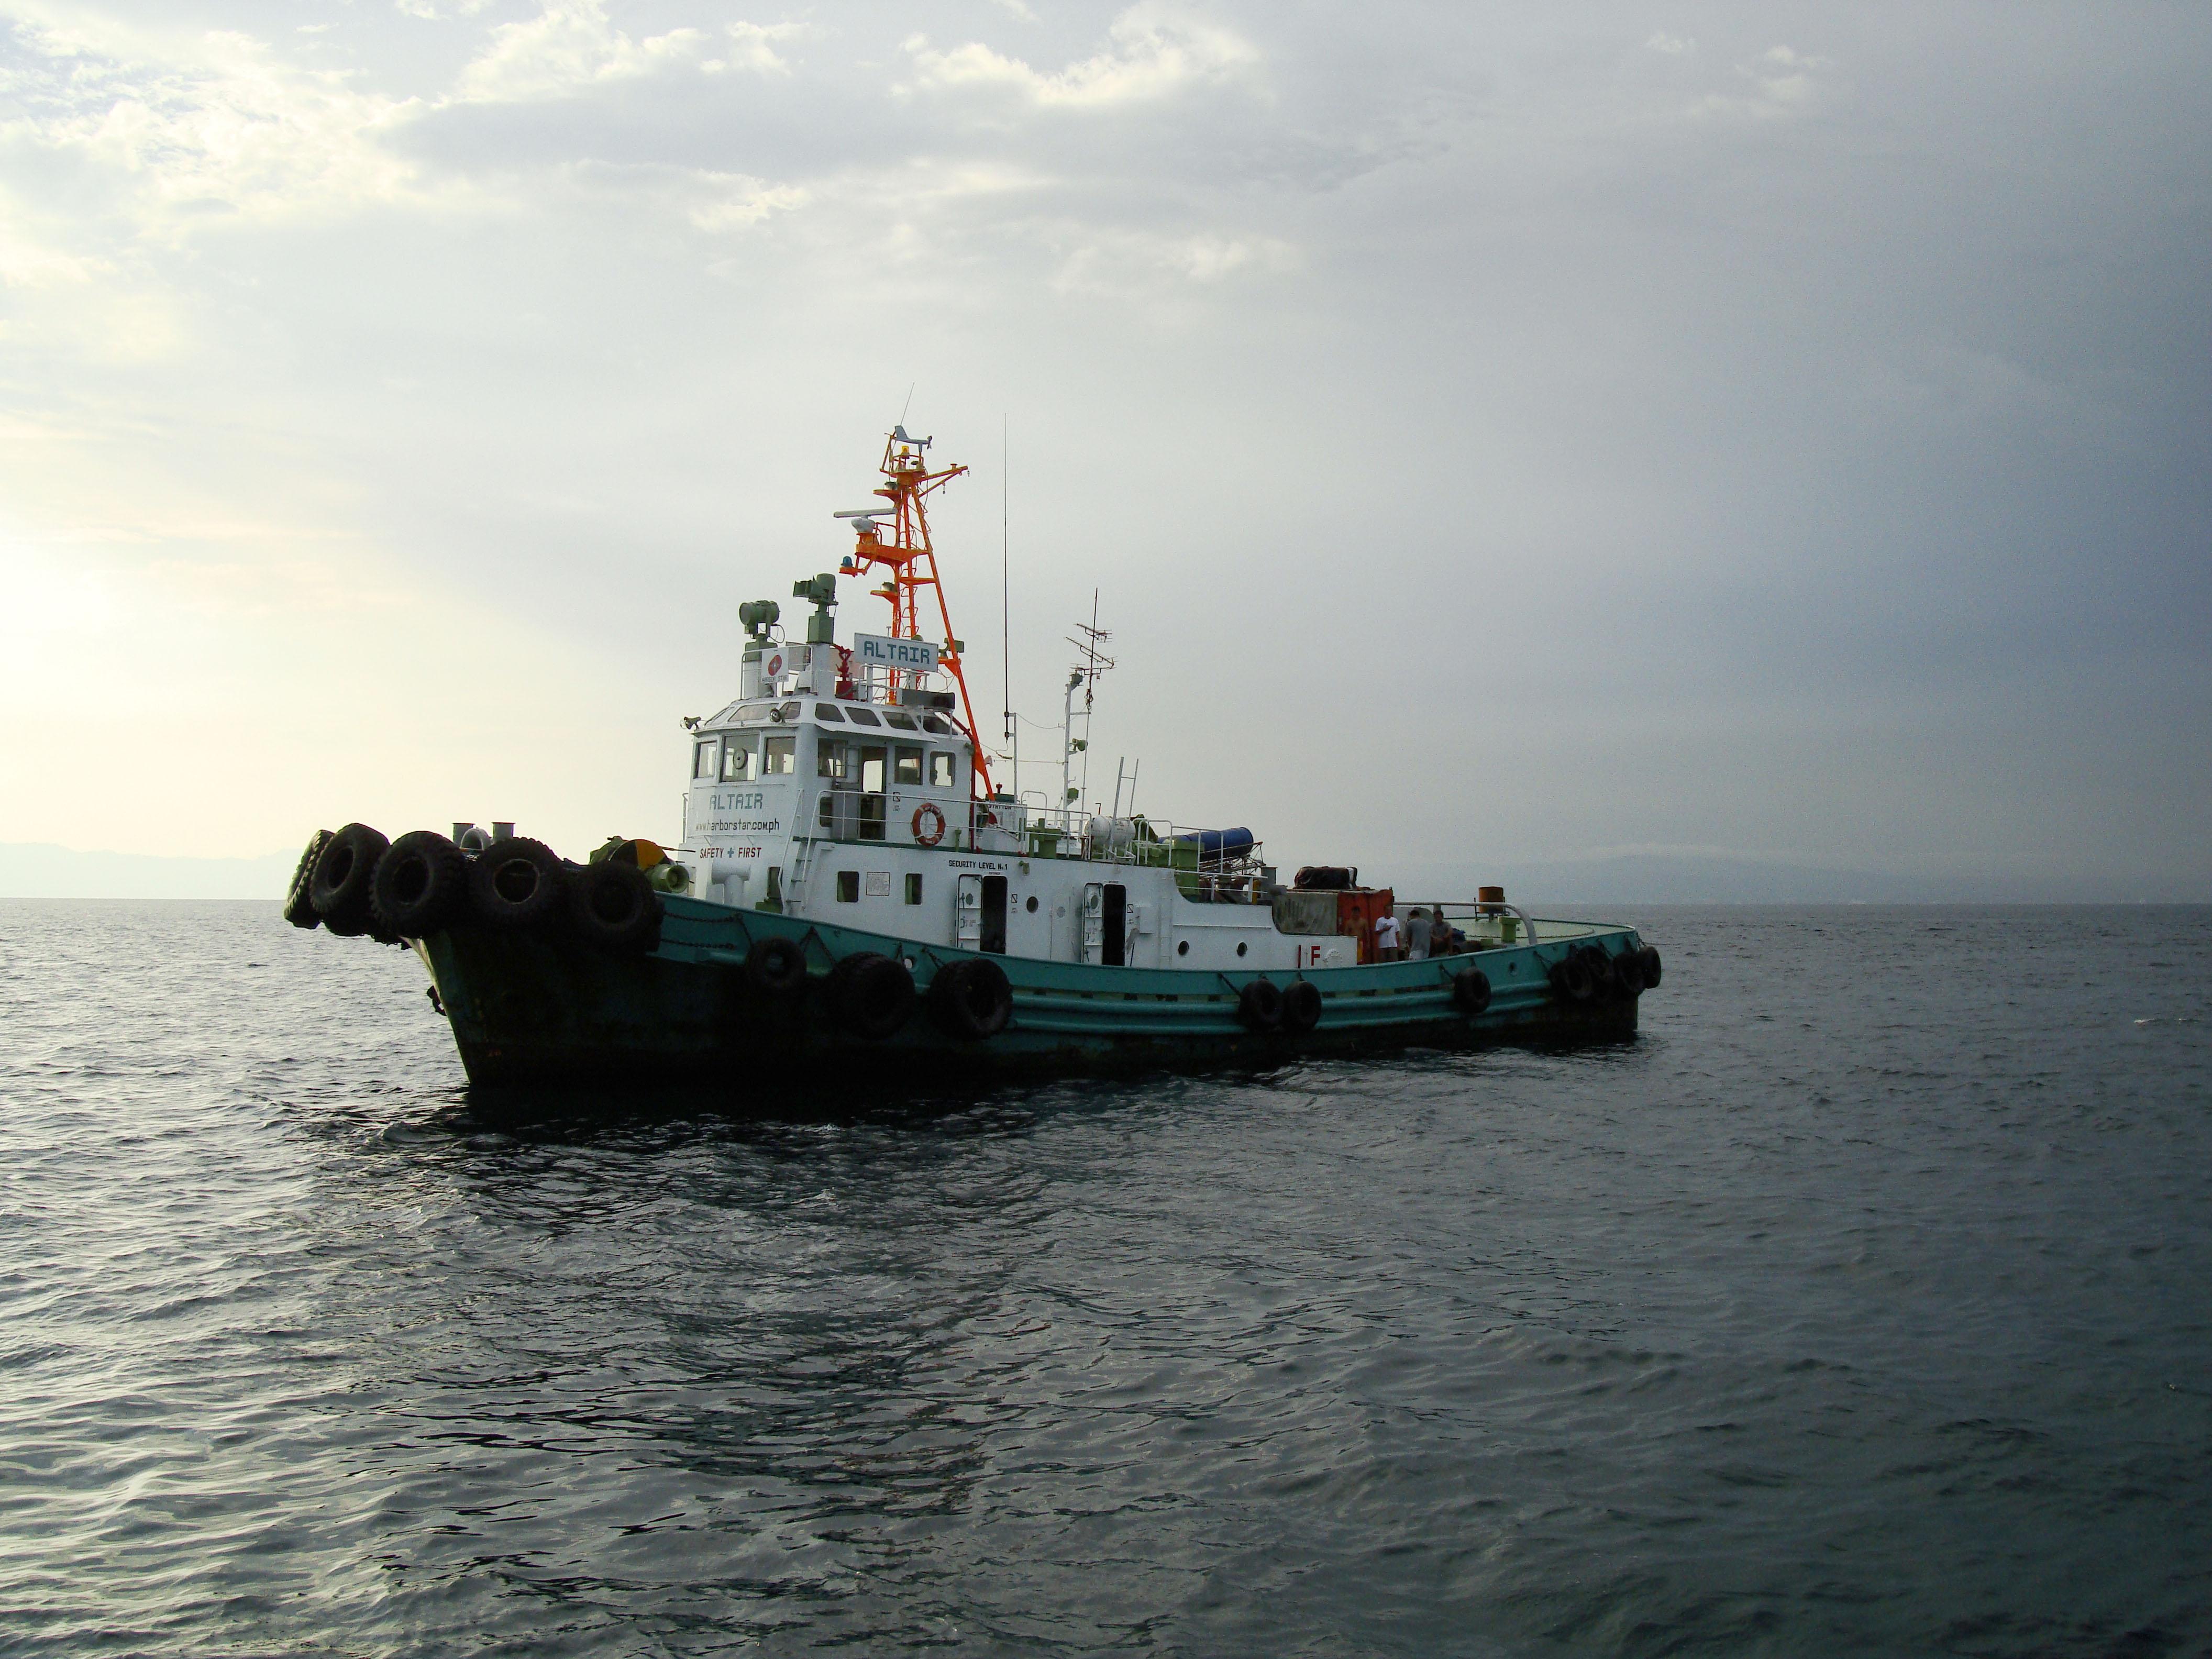 MV Altair Tug boat wwwharborstarcomph Batangus Philippines 01